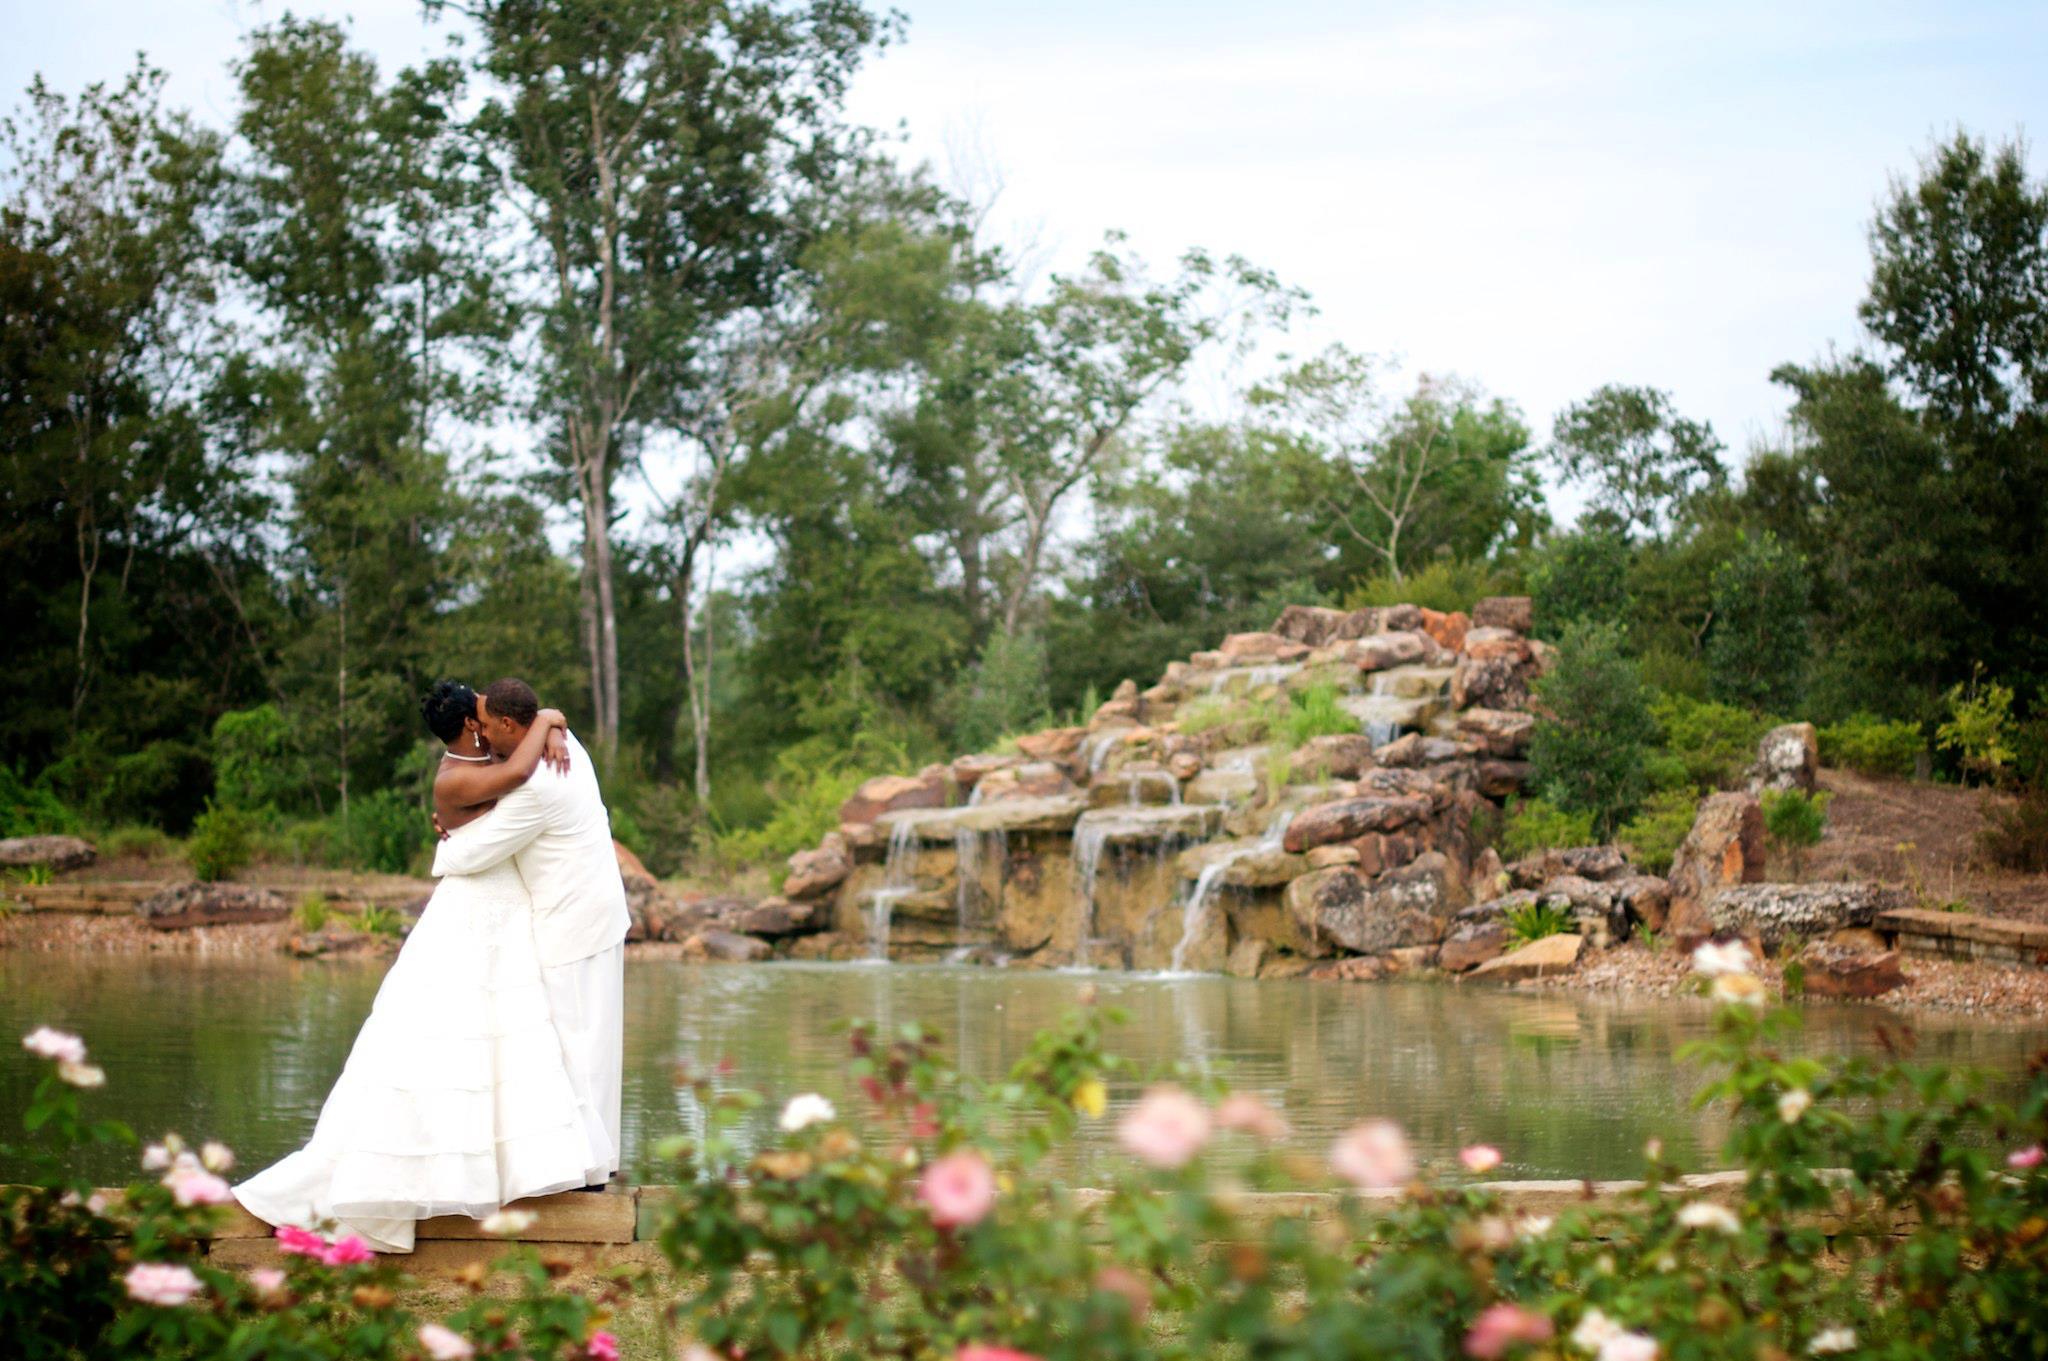 gauthier wedding 4.jpg